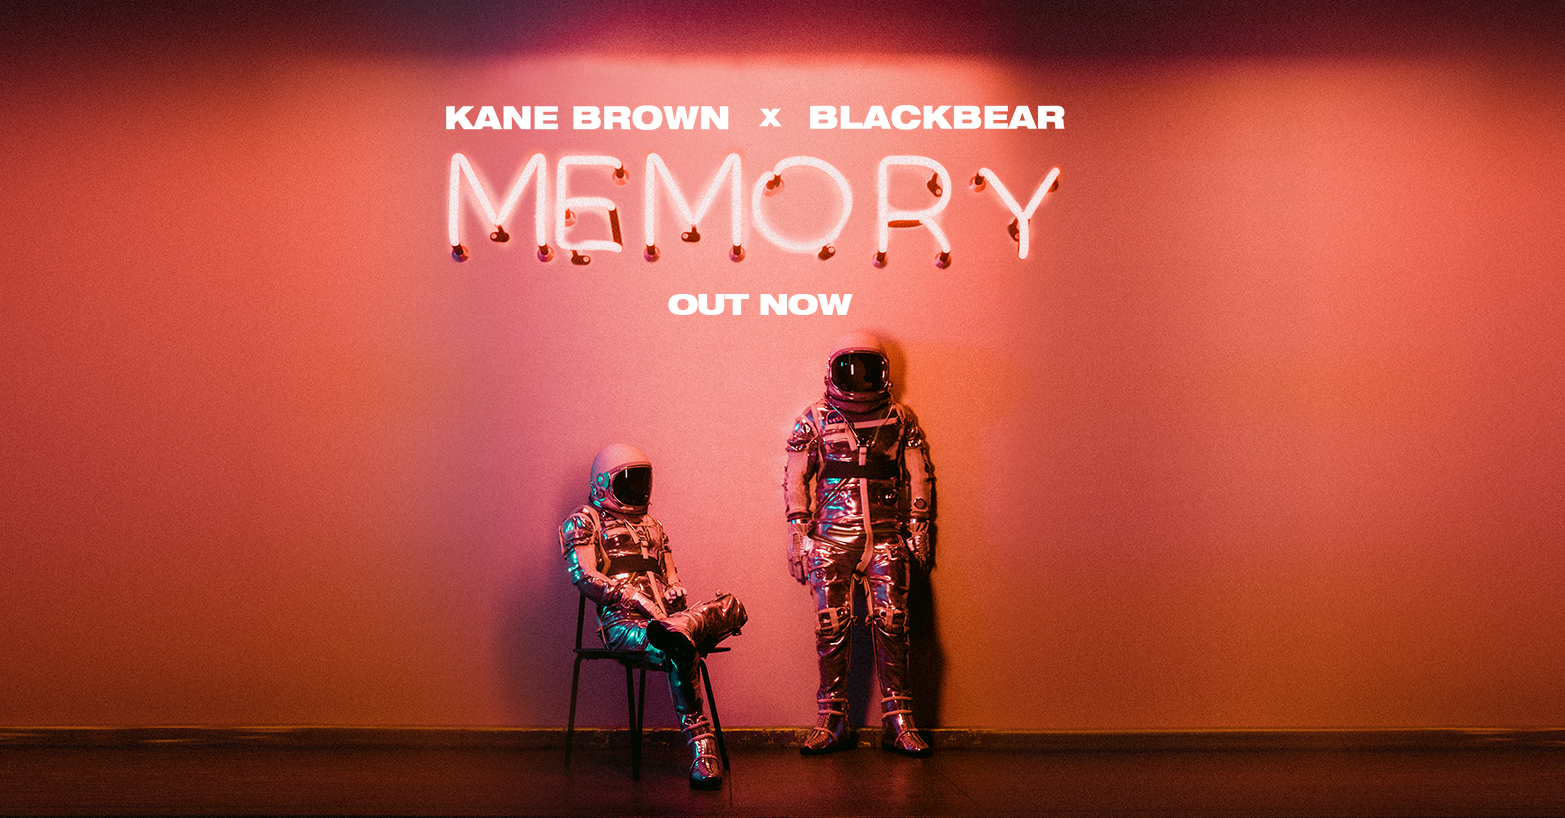 KANE BROWN x BLACKBEAR